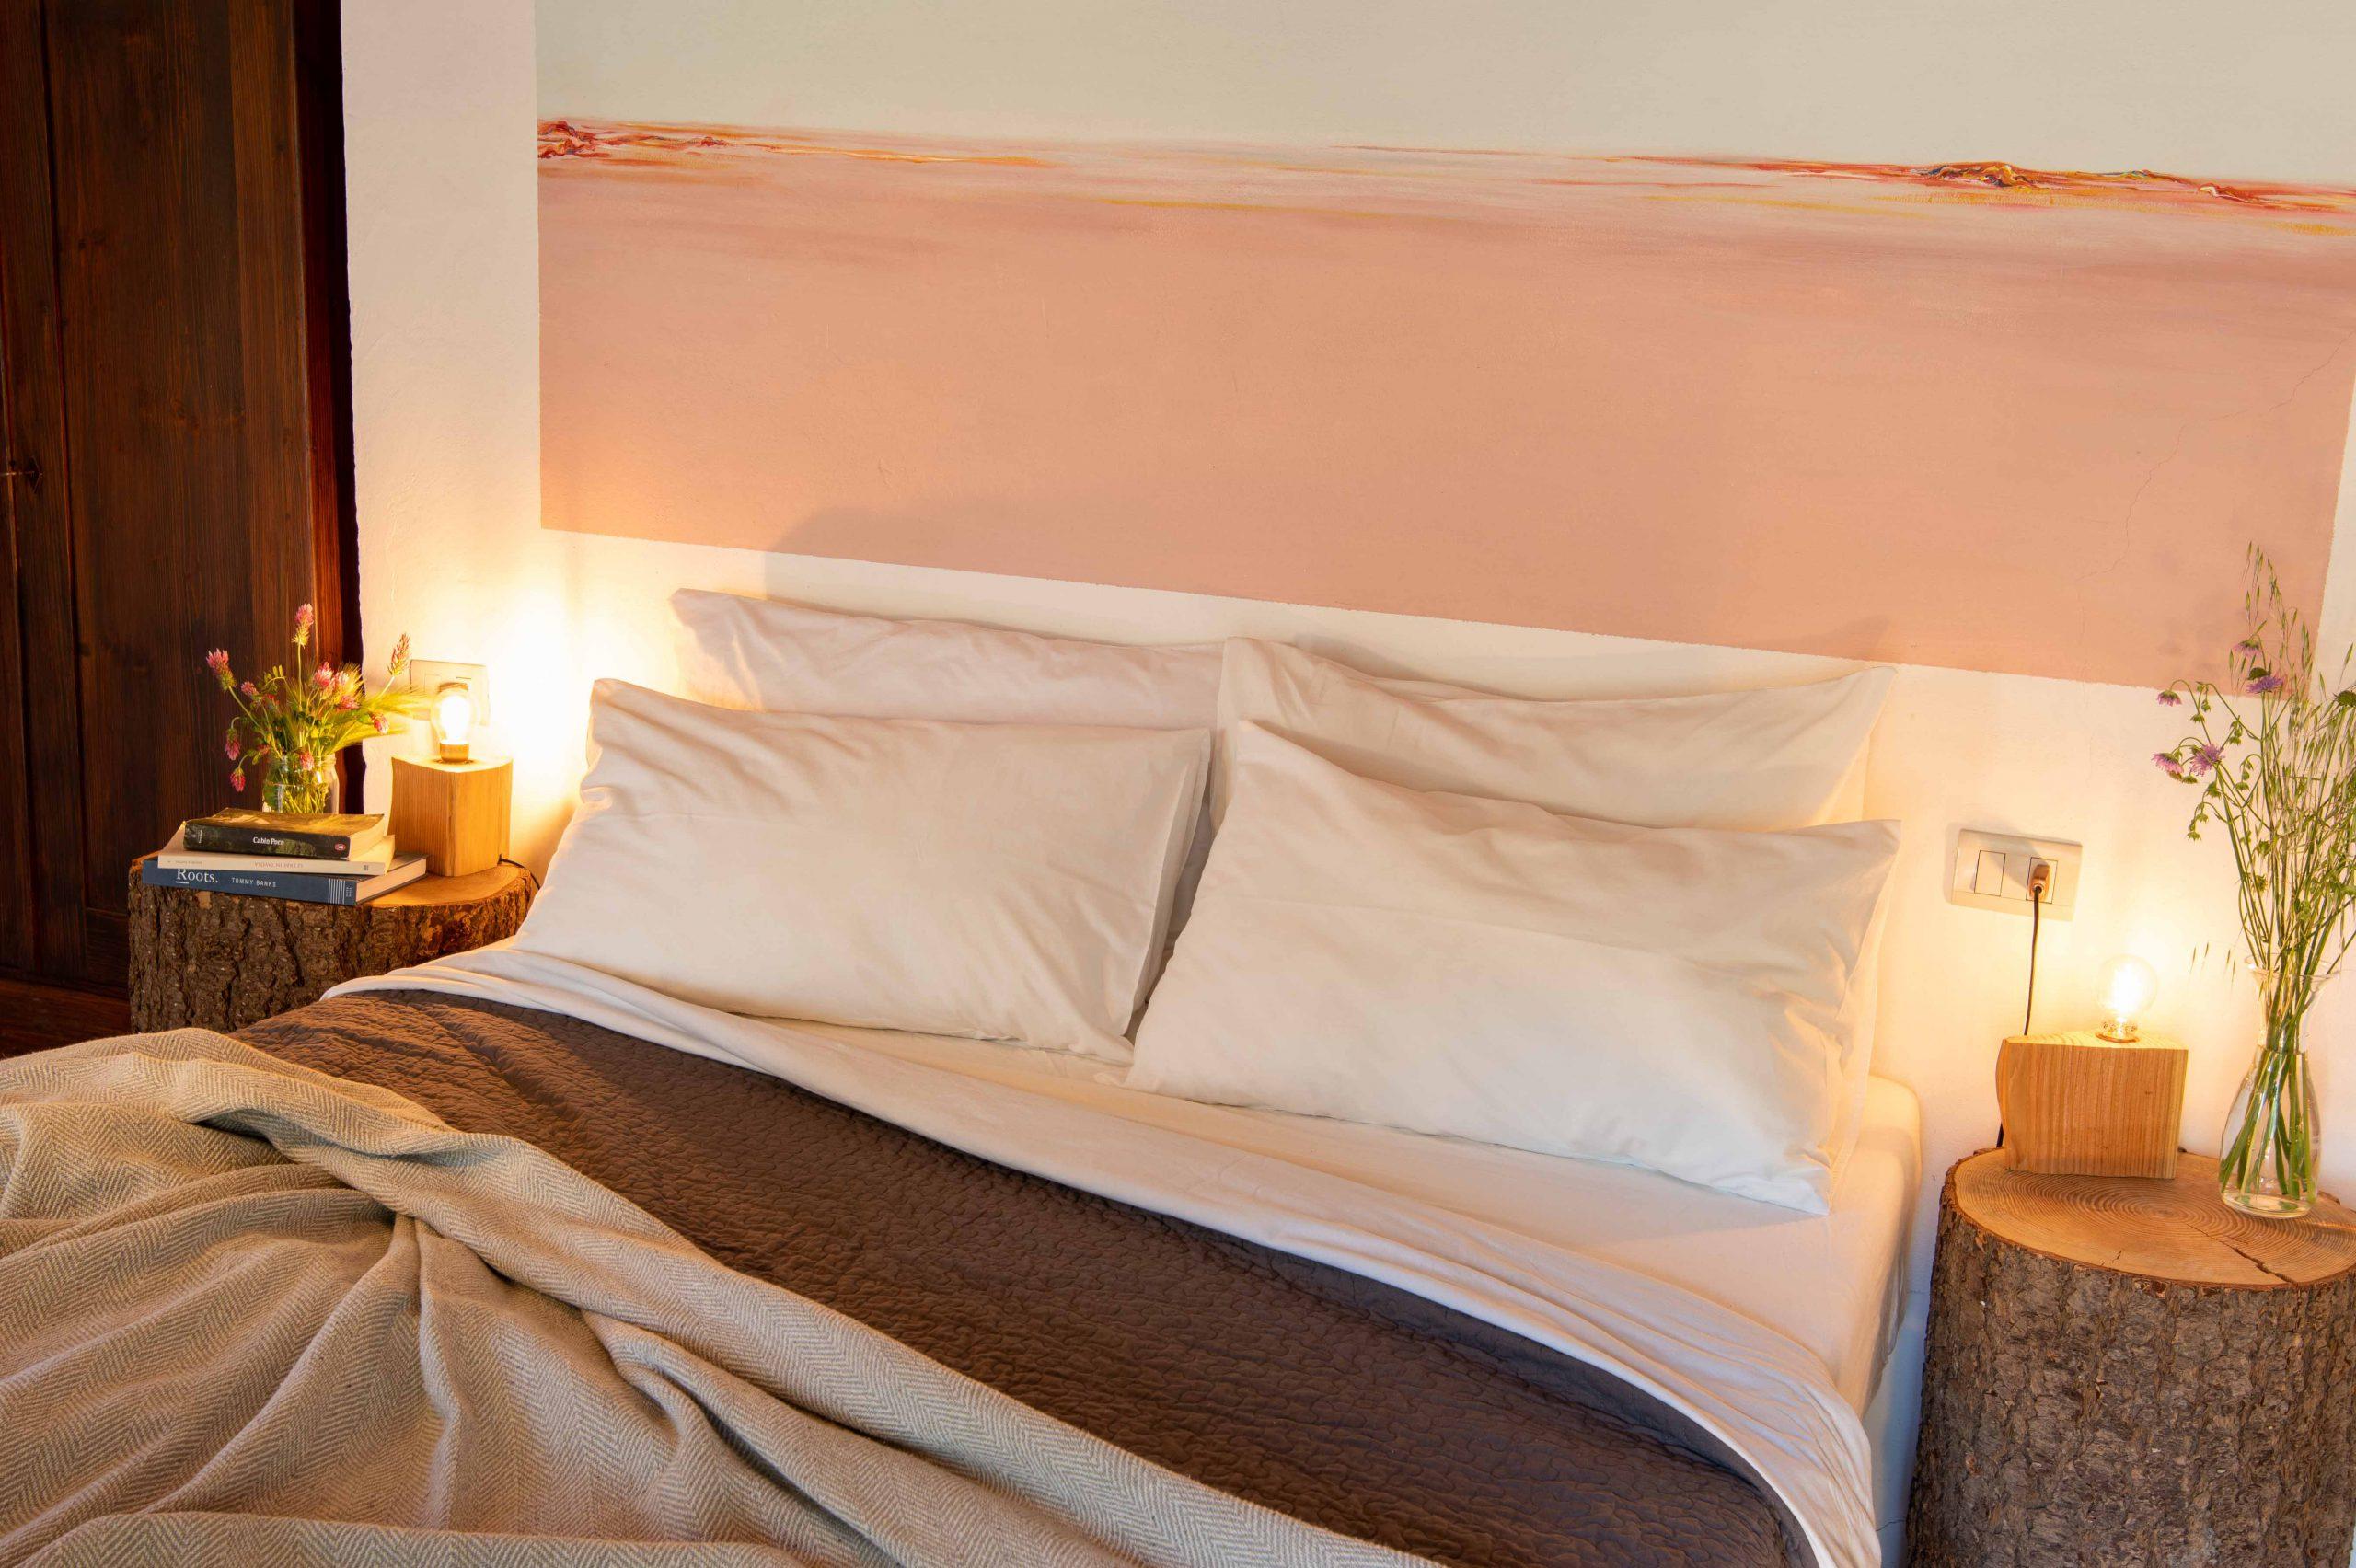 Pesco master bedroom suite-3